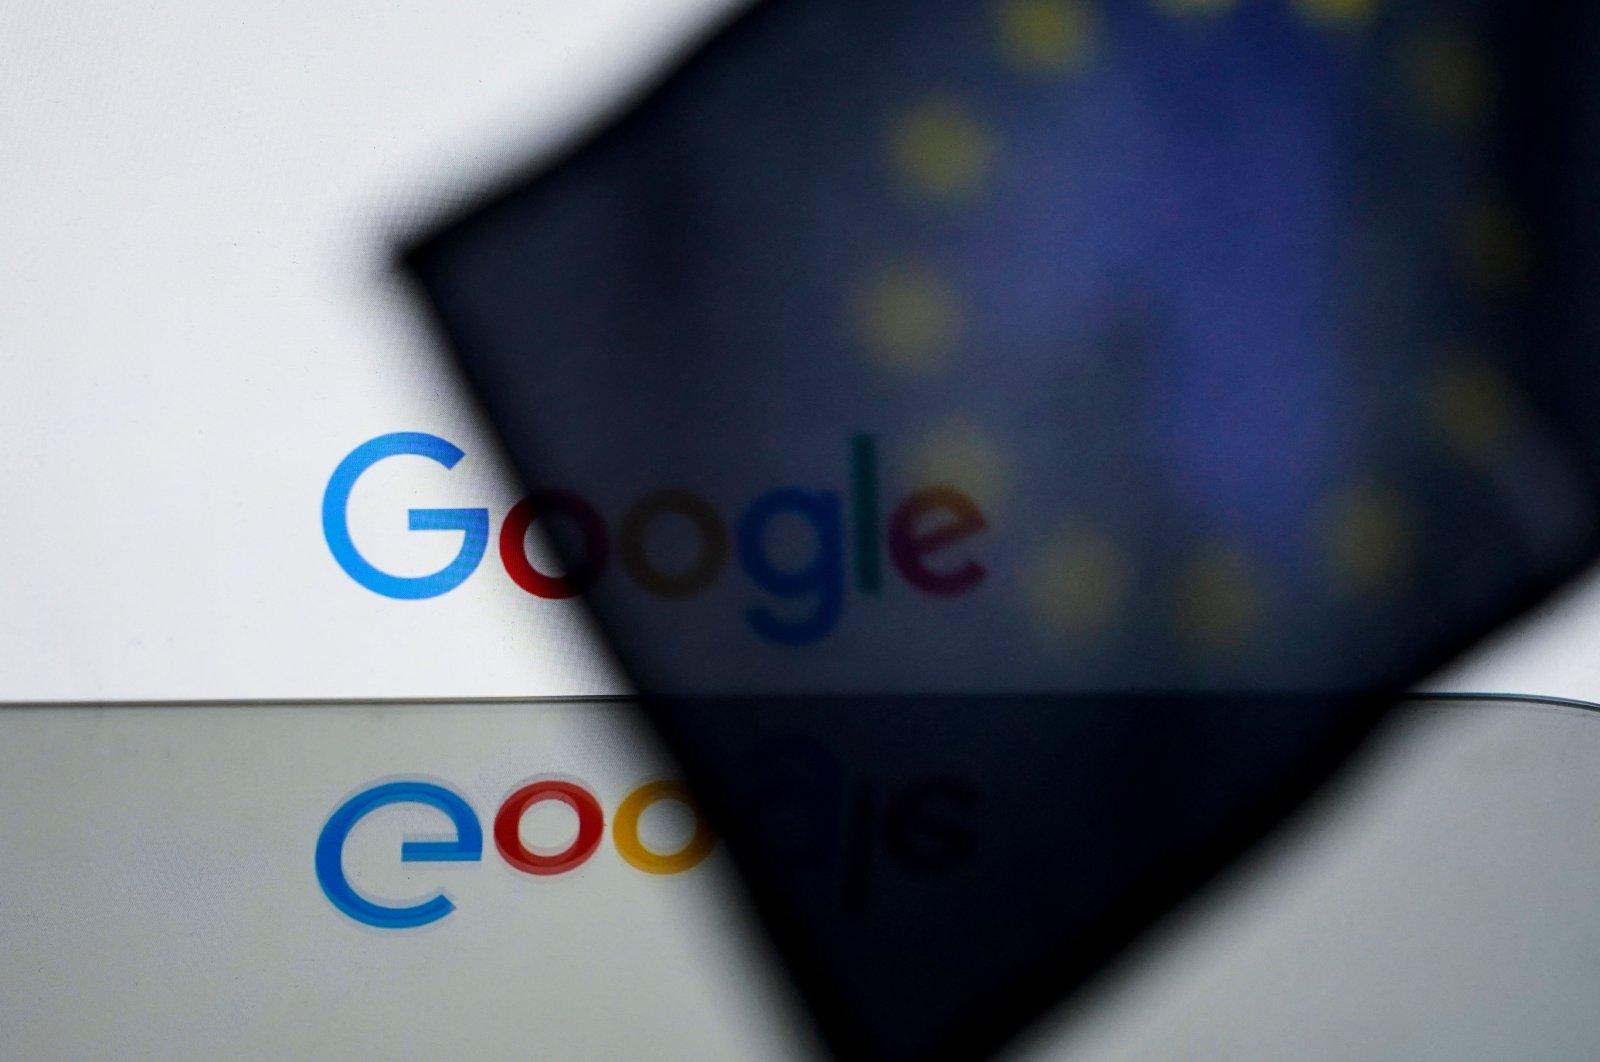 The U.S. multinational tech giant Google logo is seen behind a European flag, in Brussels, Belgium, Feb. 14, 2020. (AFP Photo)